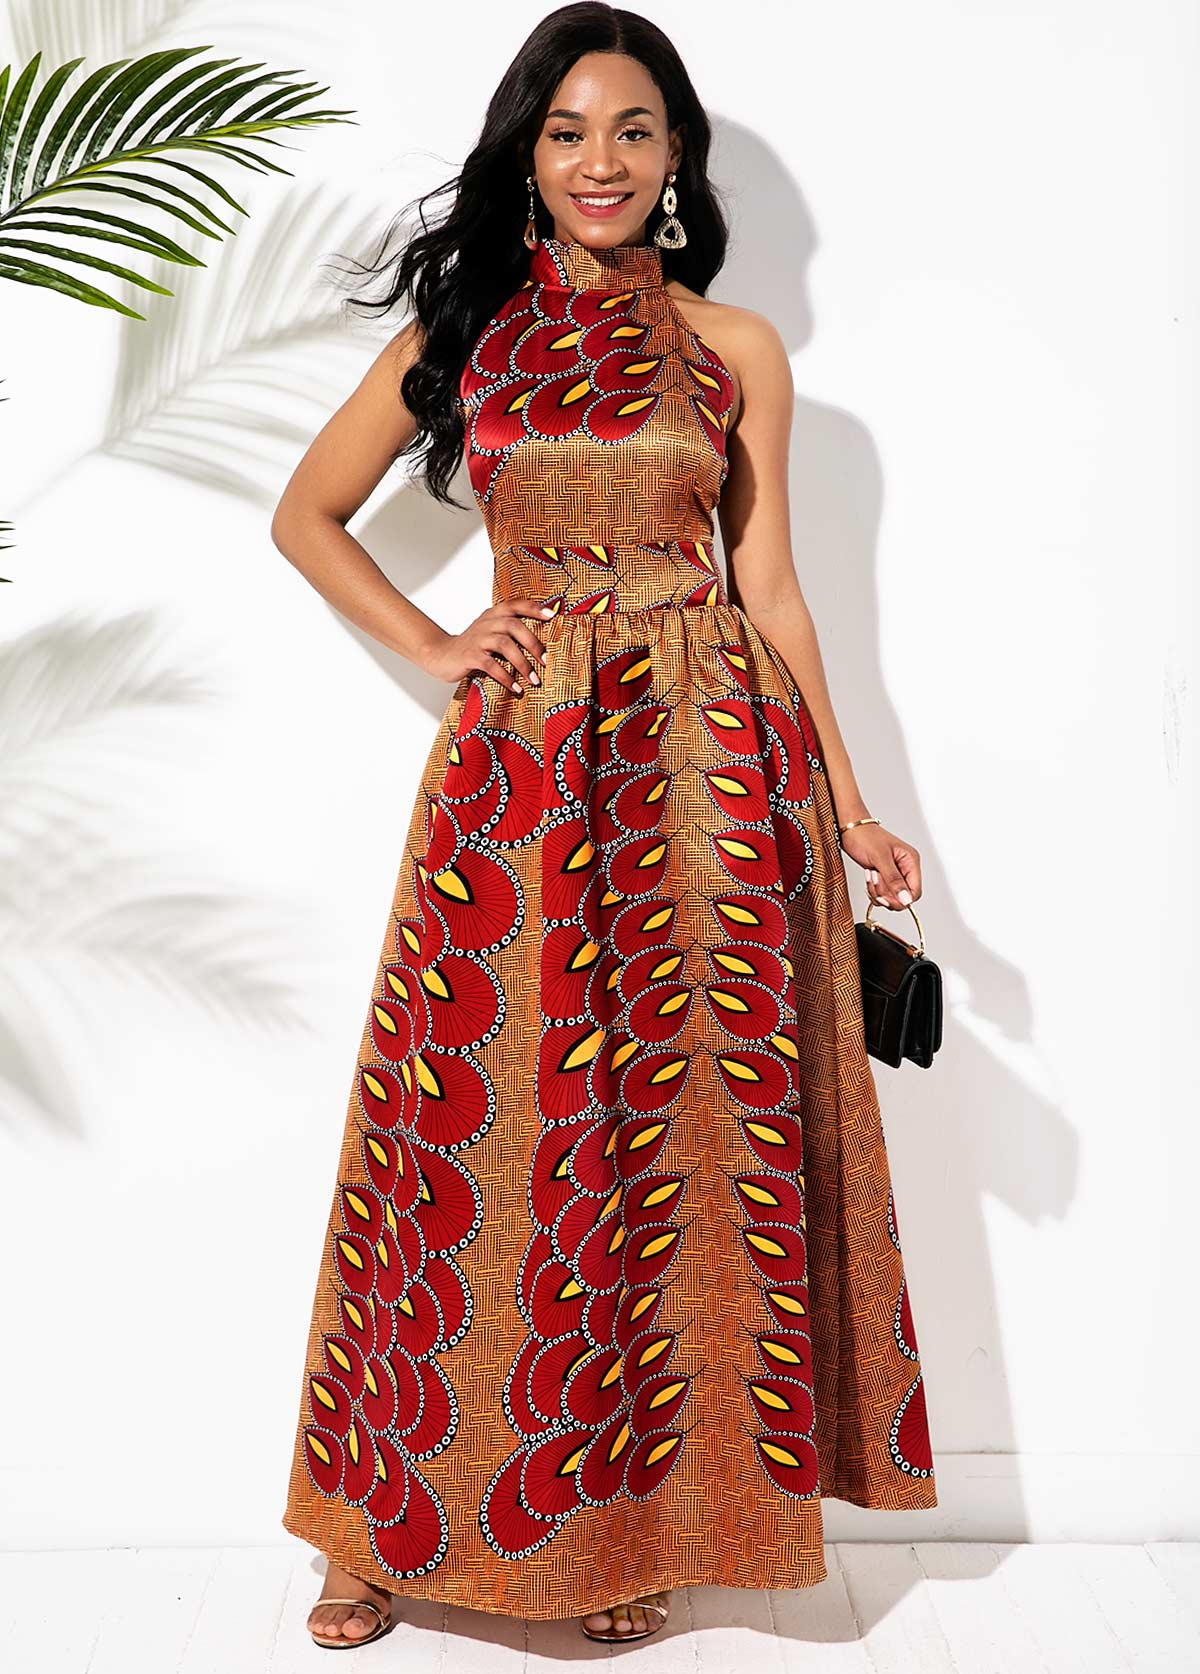 ROTITA Bowknot Back Bohemian Print Bib Neck Maxi Dress